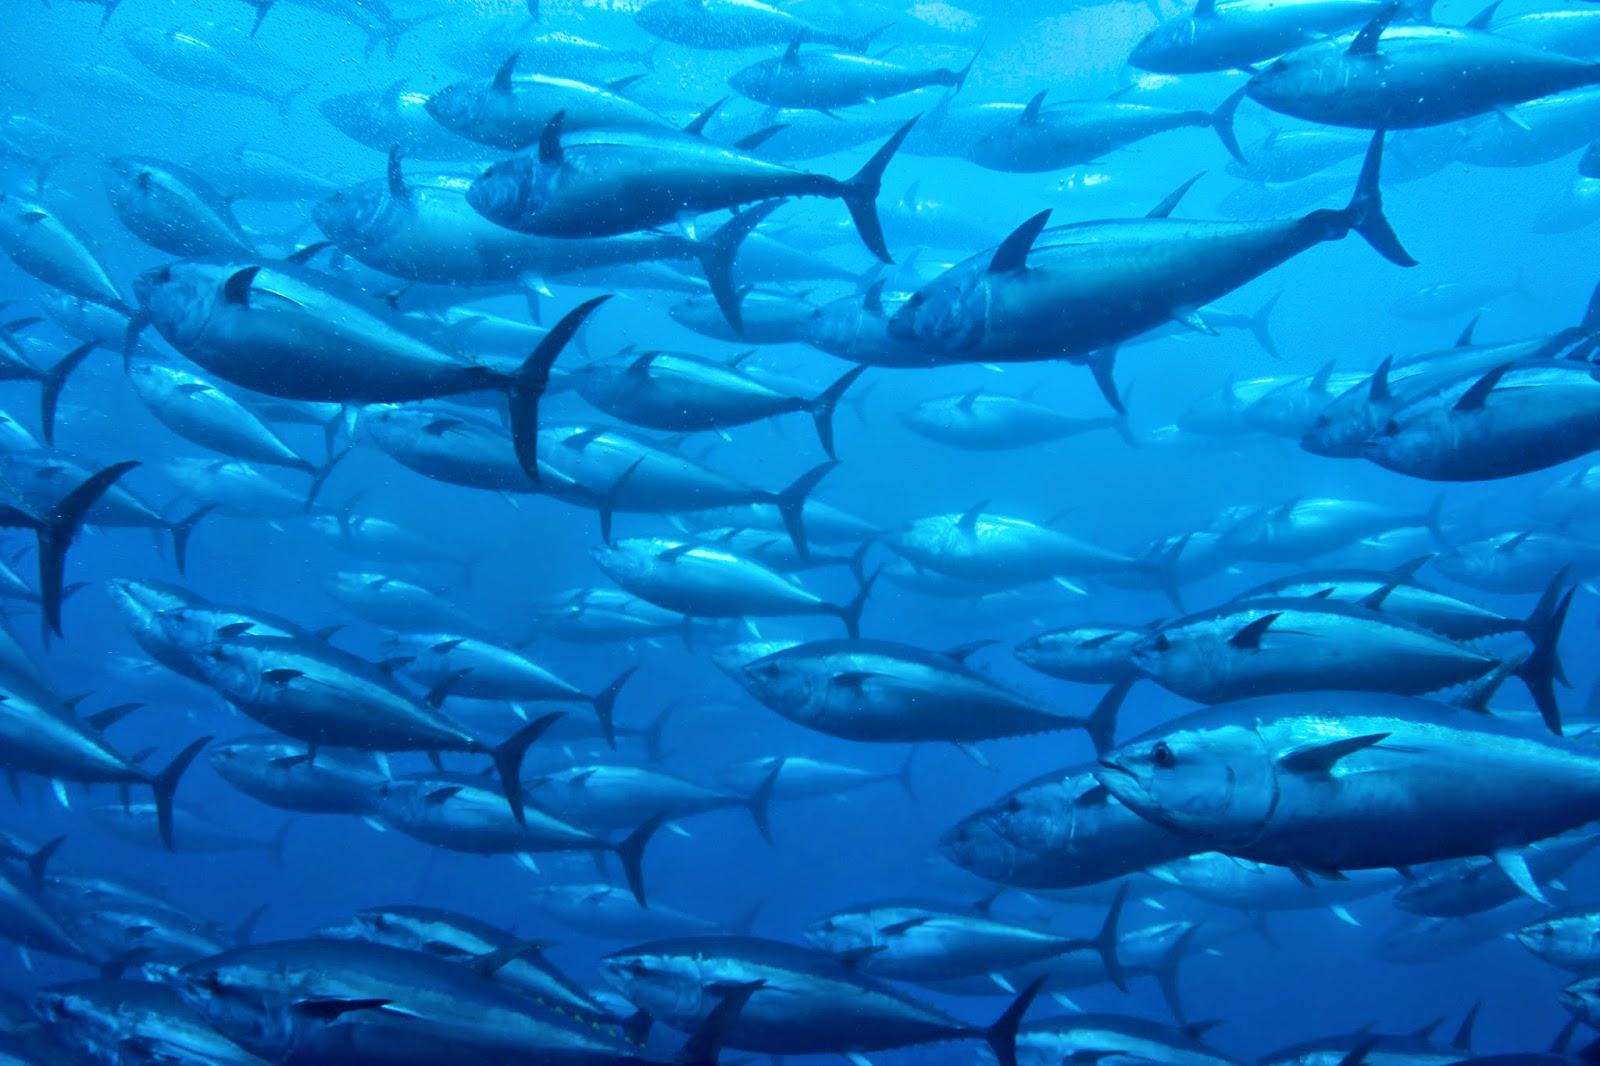 http://www.theguardian.com/world/2015/jan/05/sushi-boss-nets-bluefin-tuna-25k-tokyo-tsukiji-fish-market